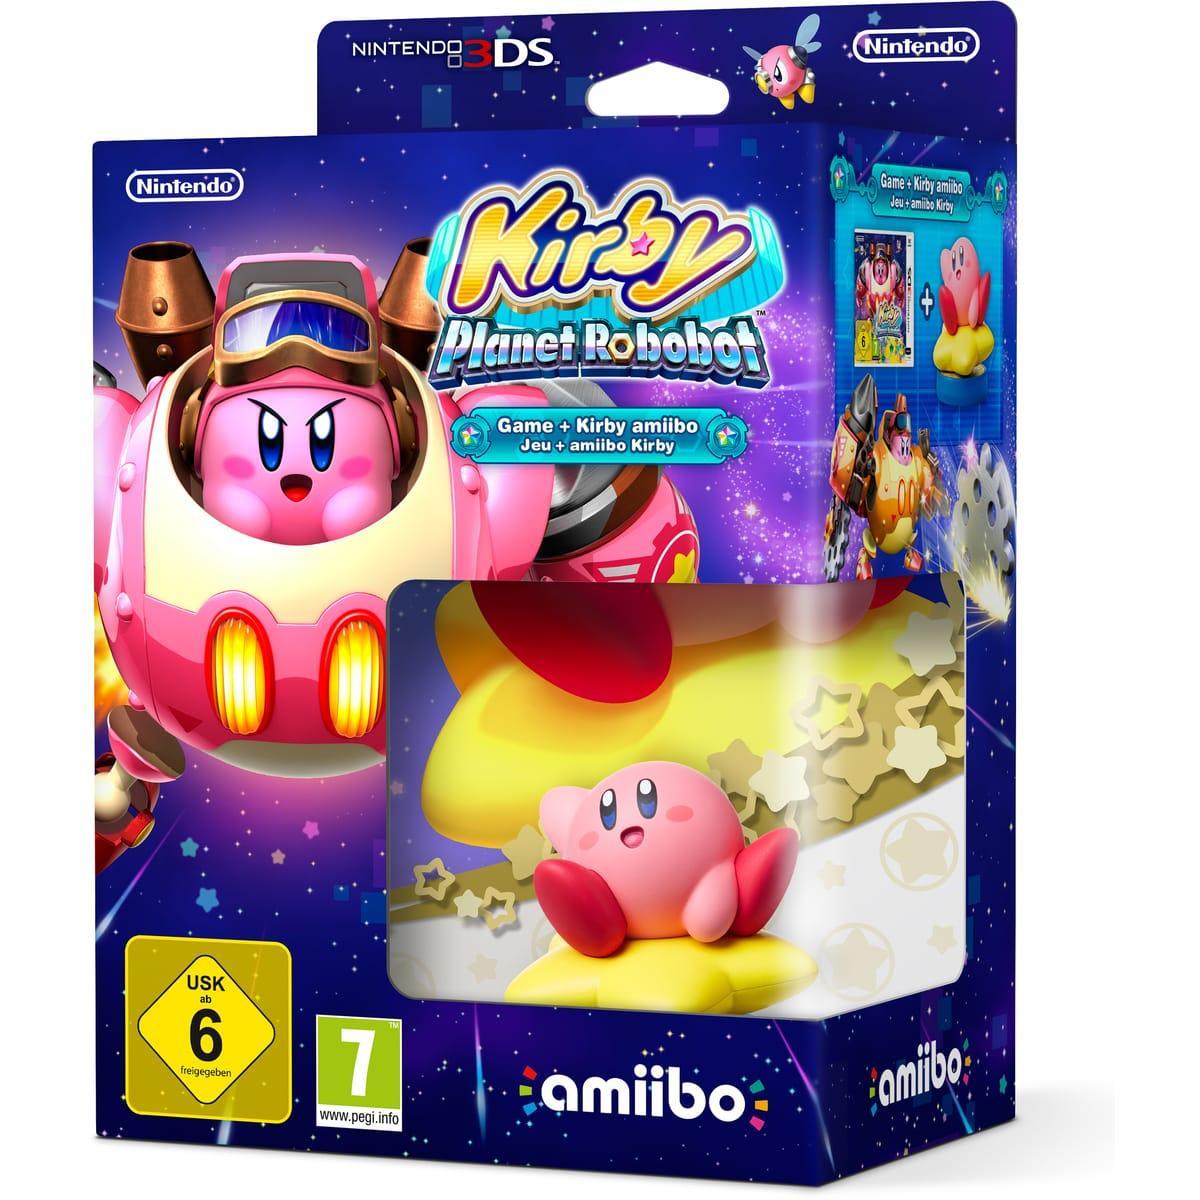 [Précommande] Kirby Planet Robobot sur 3DS + Amibo Kirby + Notebook offert